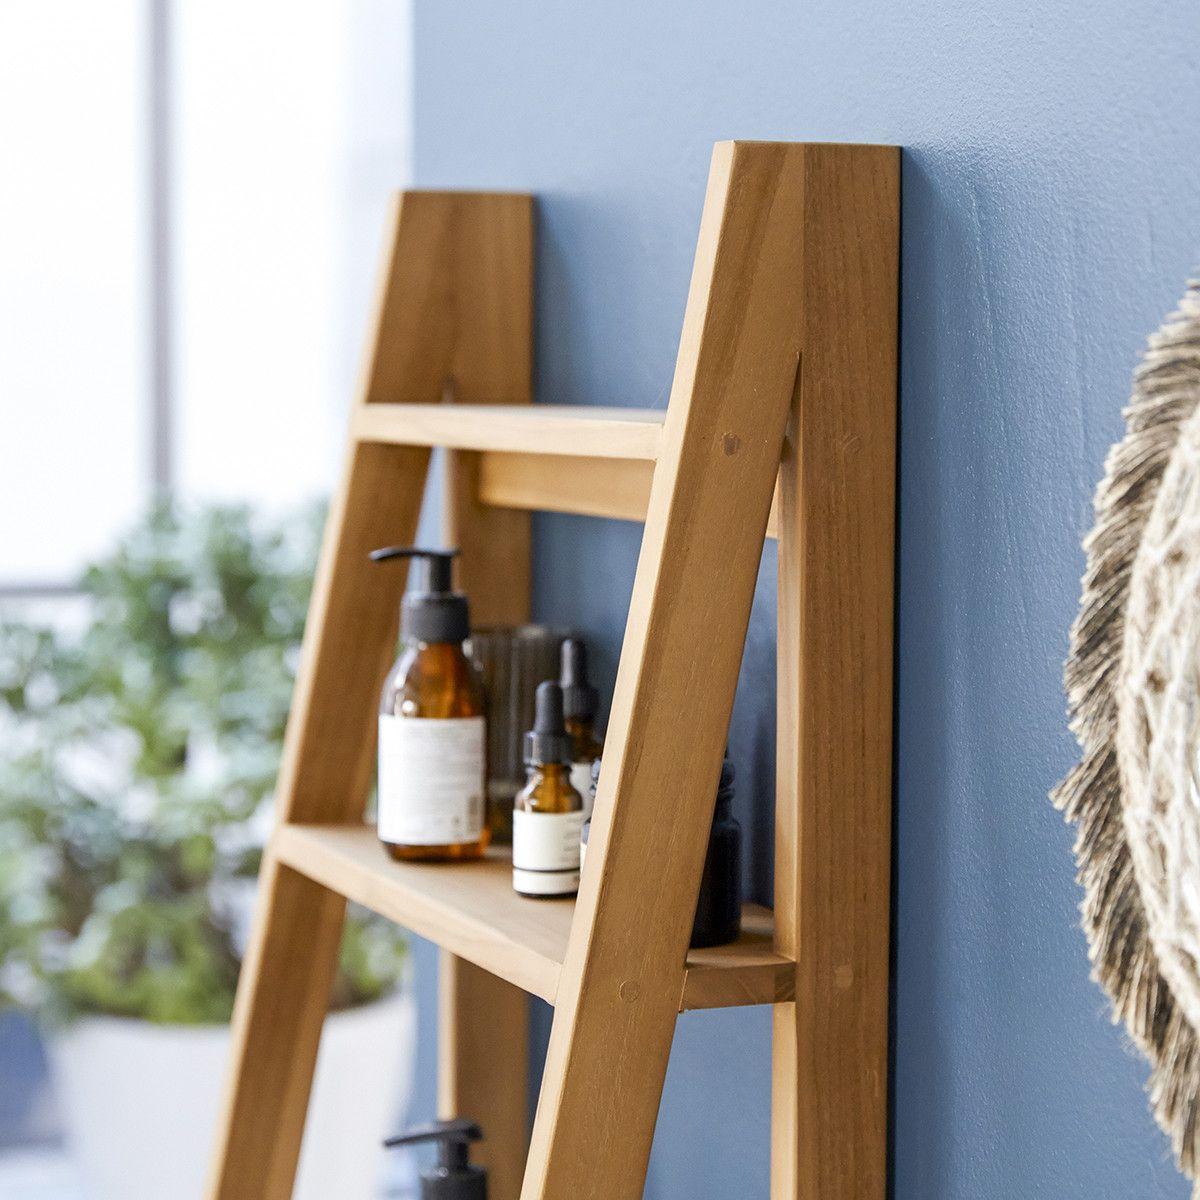 Solid Teak Bathroom Shelf Vertical Tier Design Natural Bathroom Furniture In 2020 Teak Bathroom Step Shelves Teak